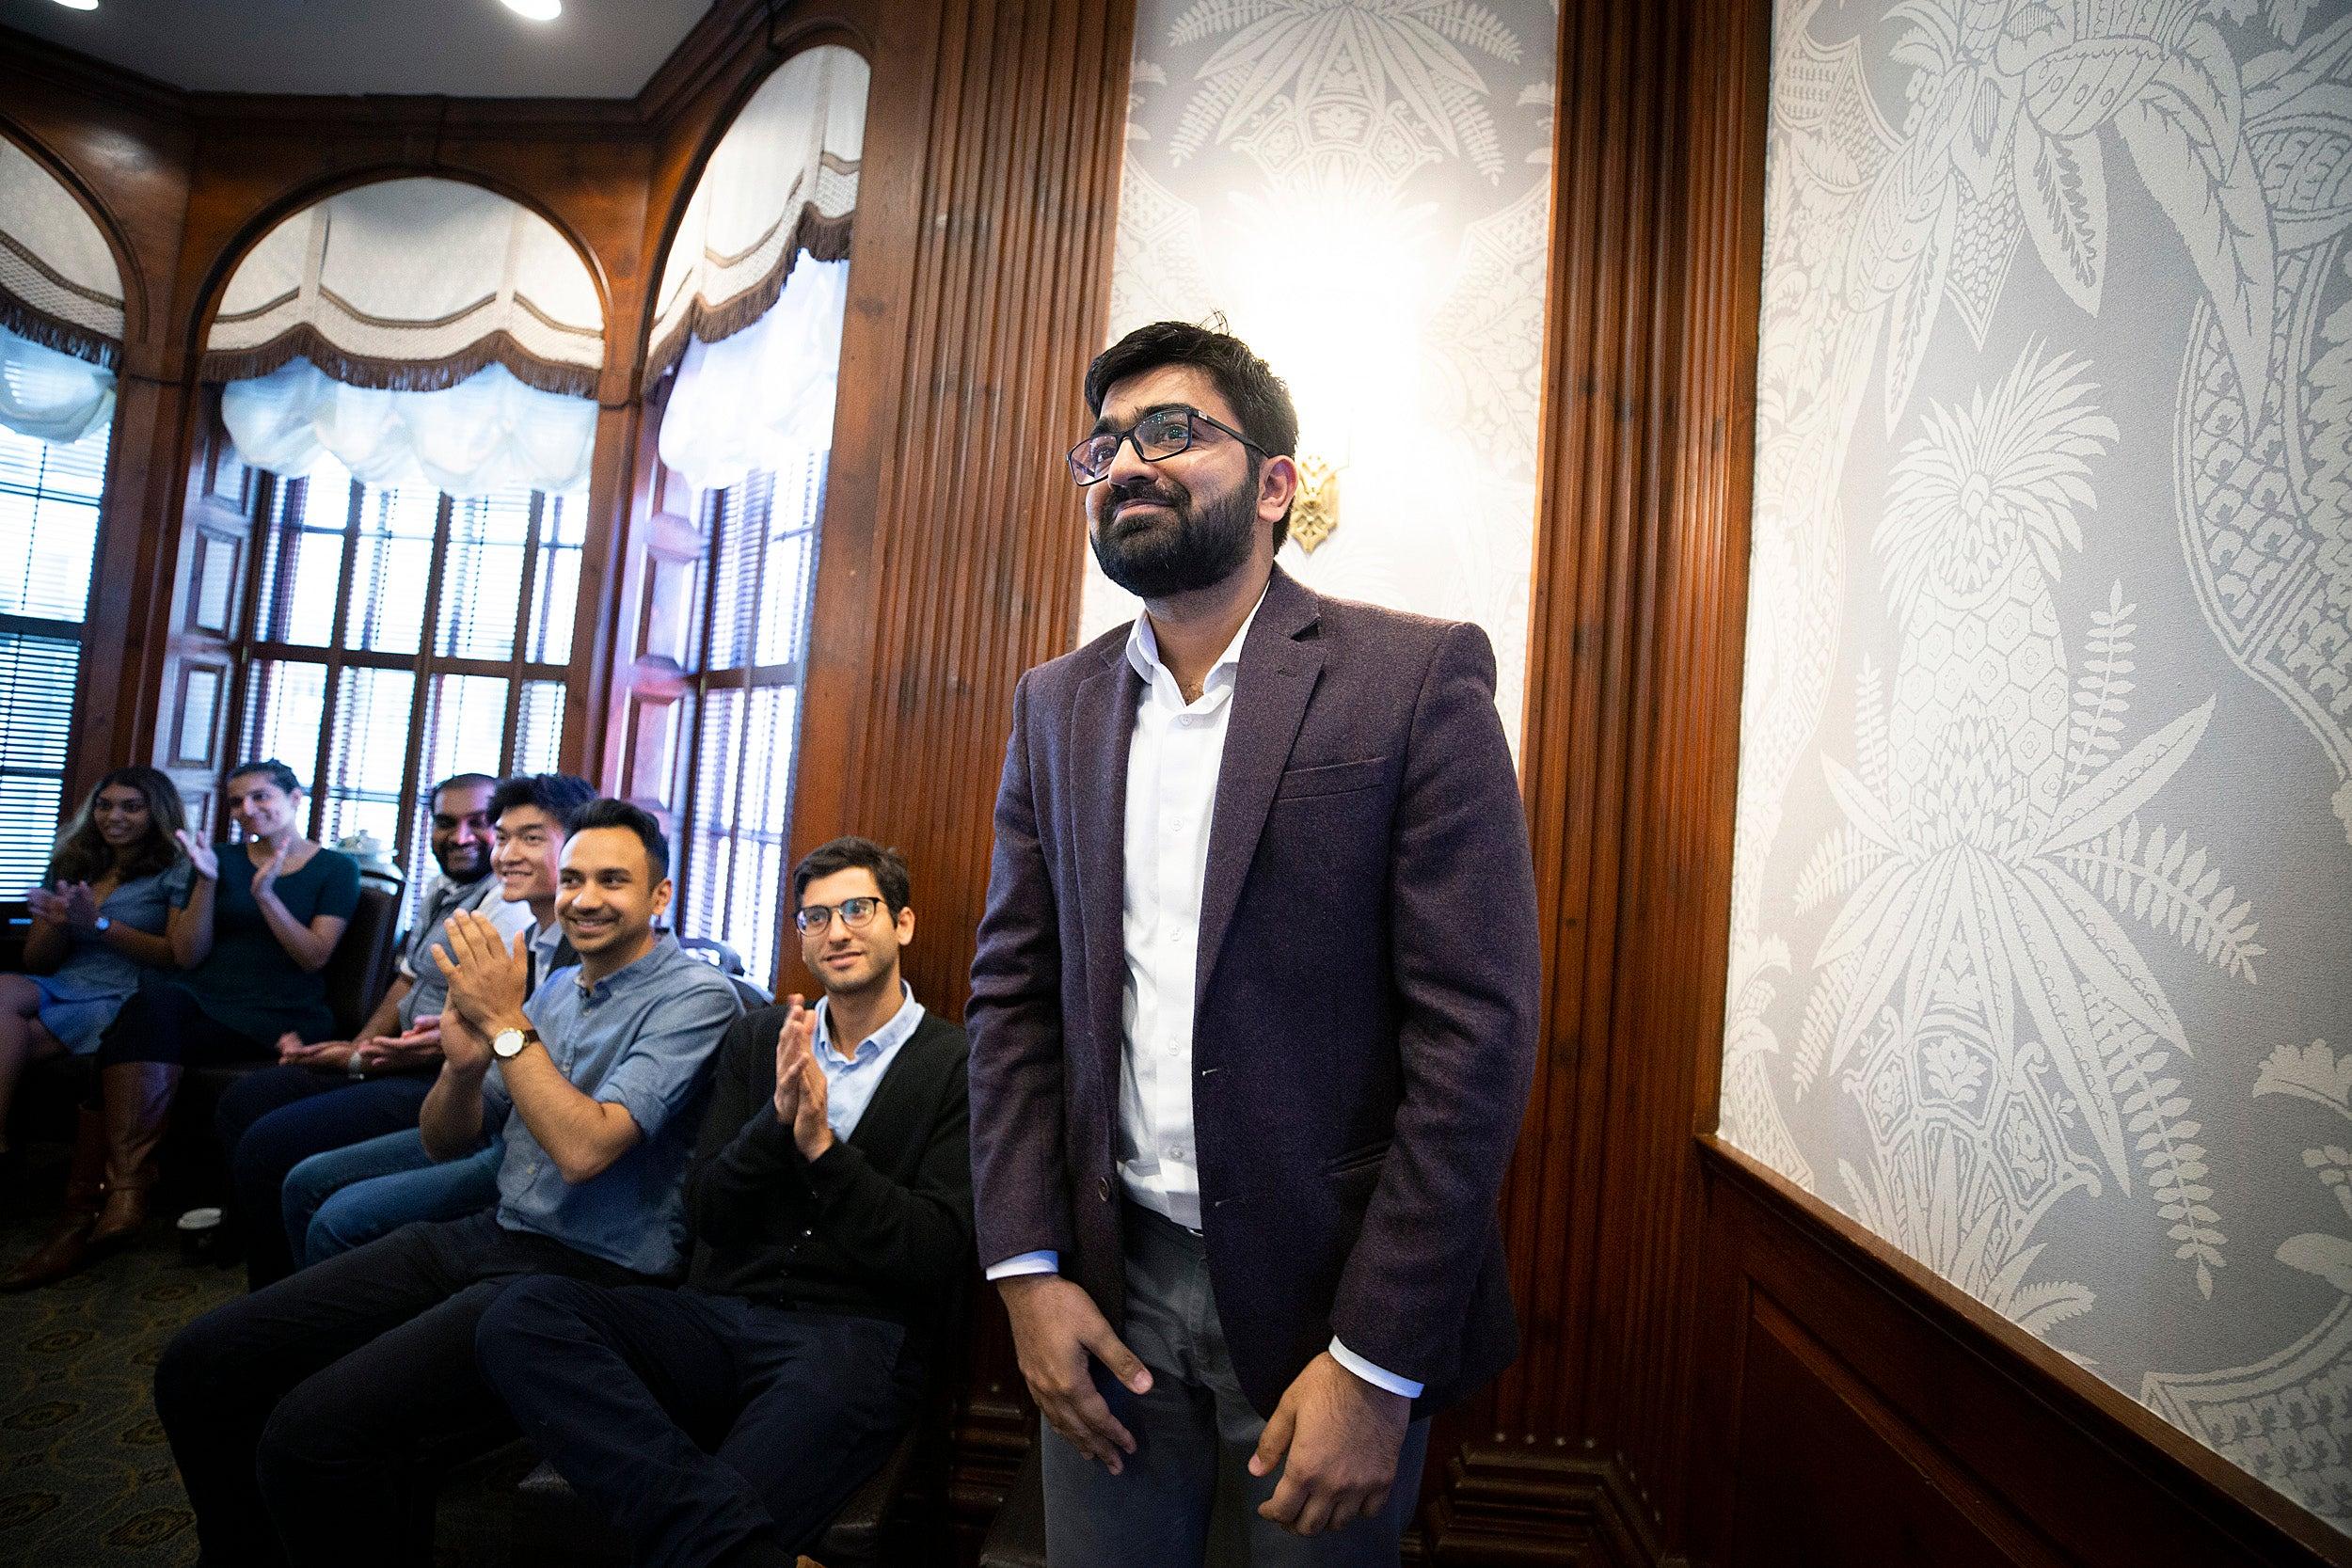 Vikas Birhma '19 (right) is announced as the winner for the organization Gramhal.